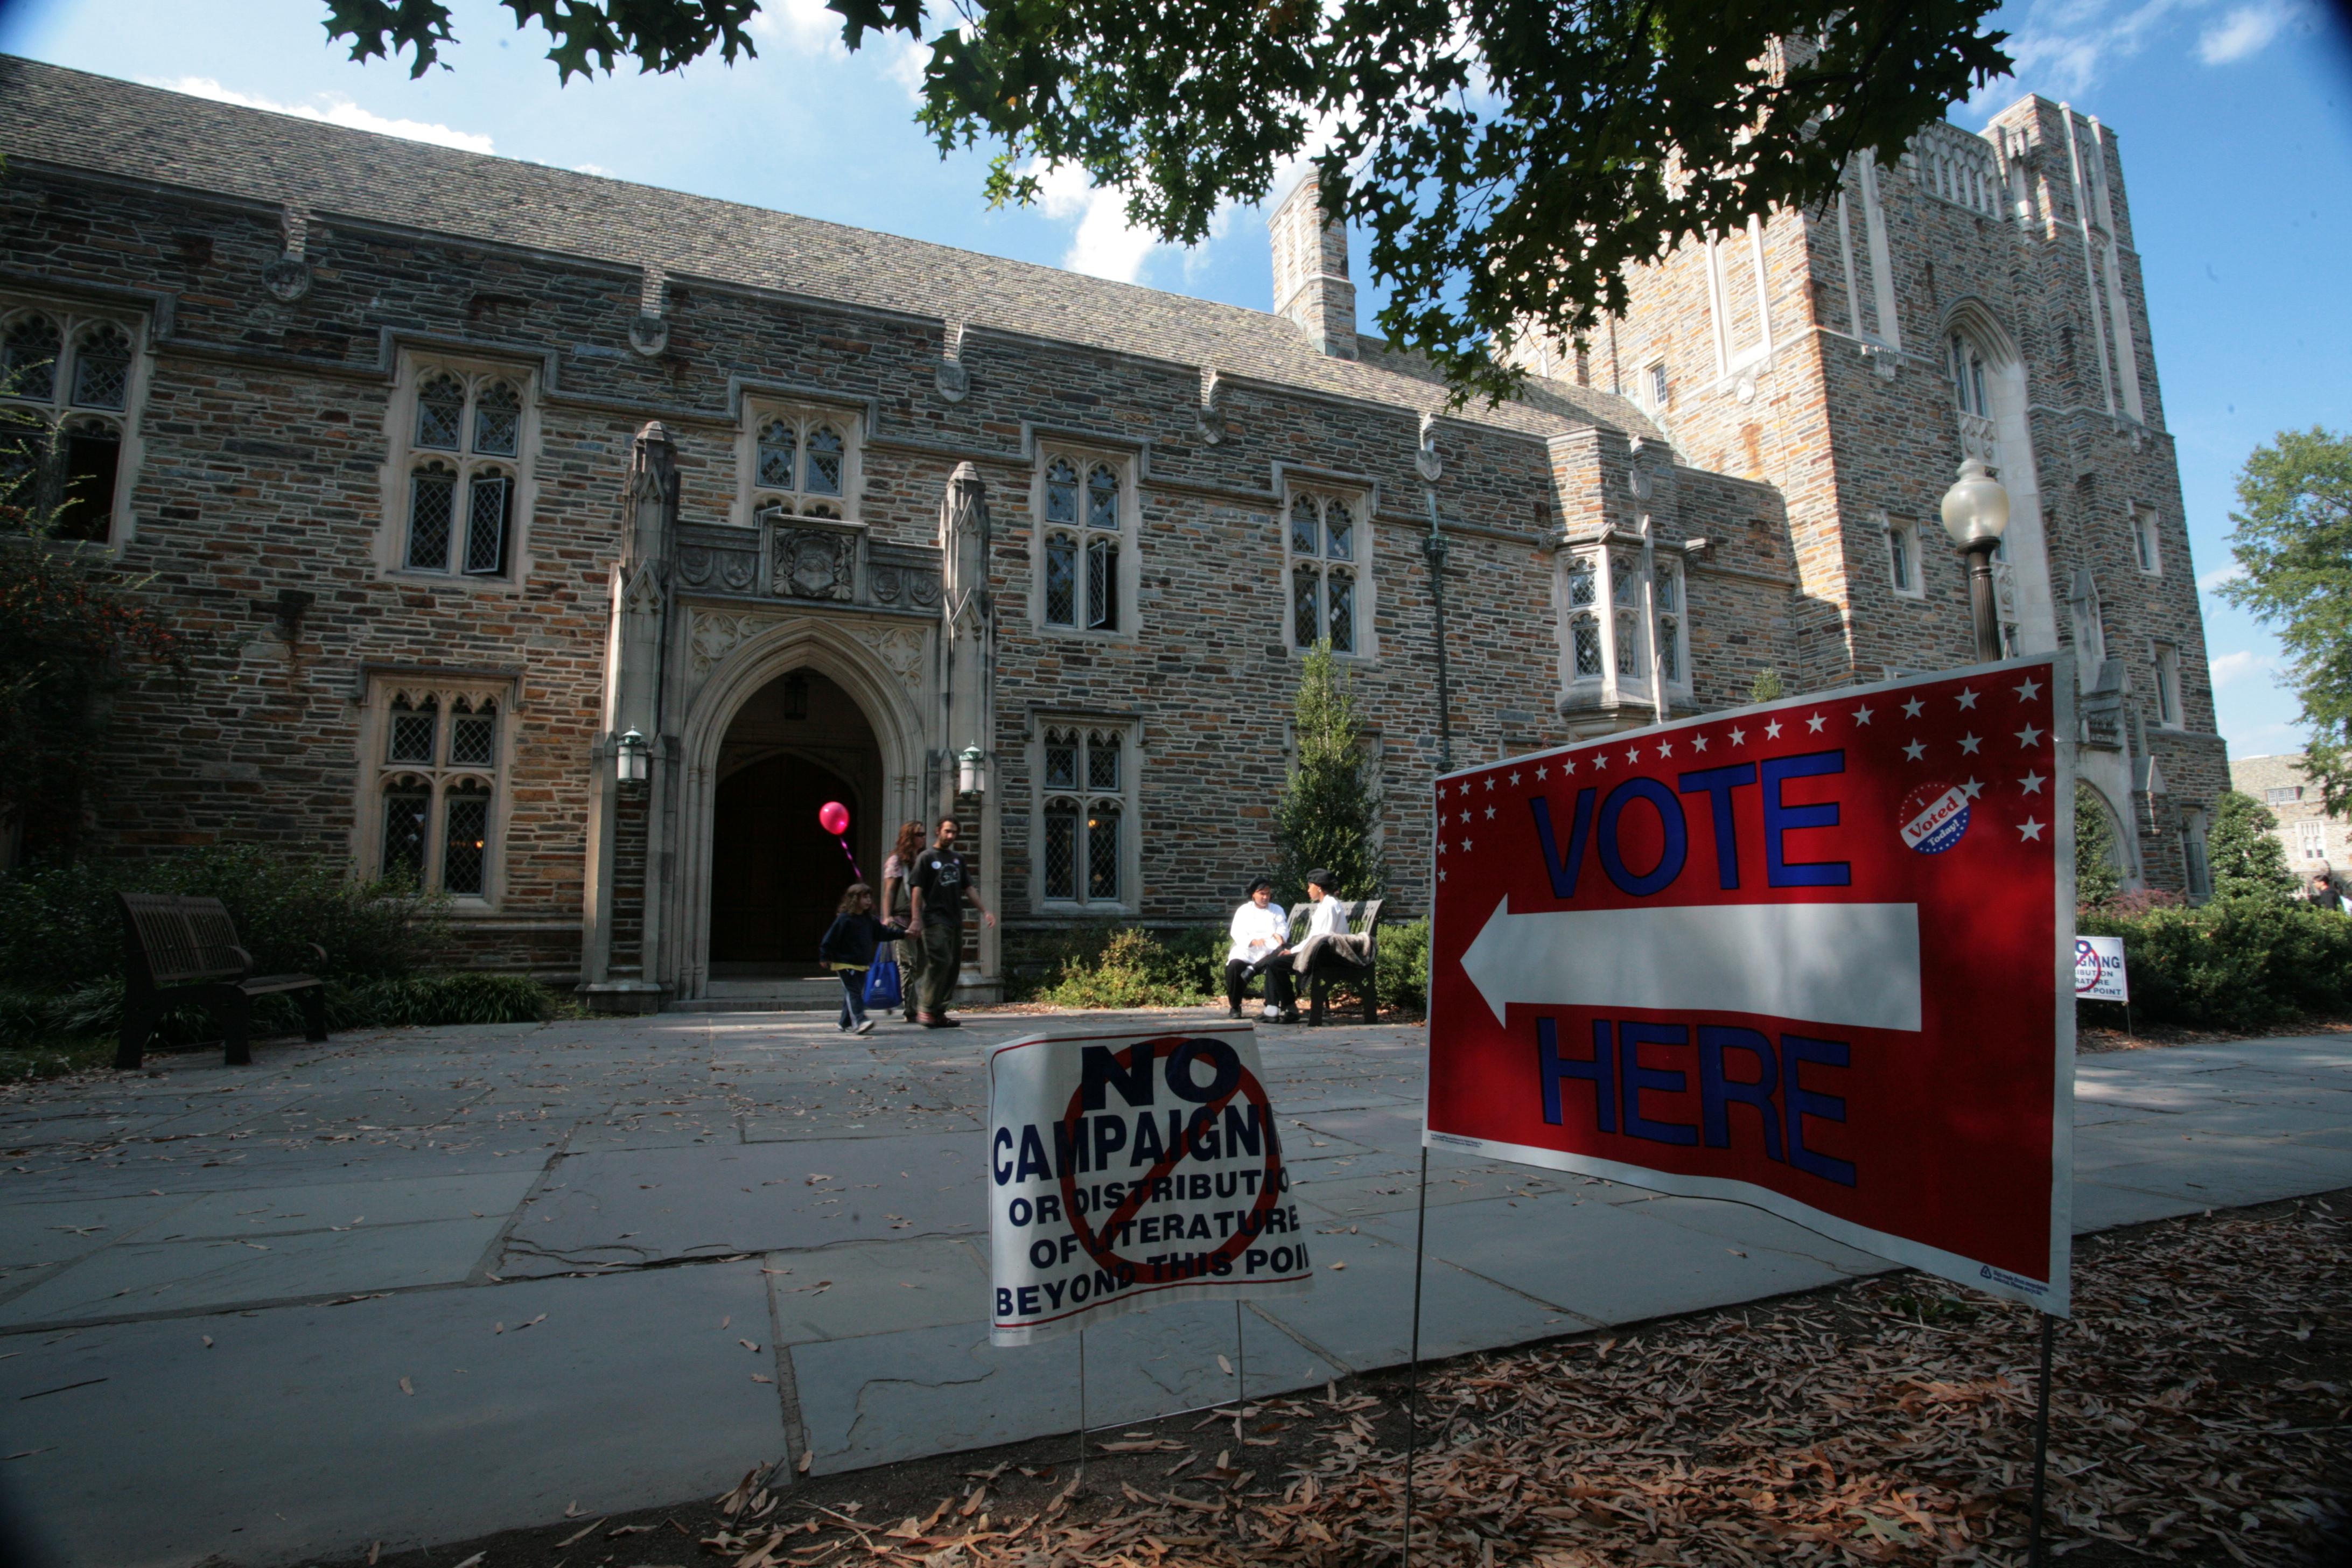 Polling station at Duke University, Durham, NC